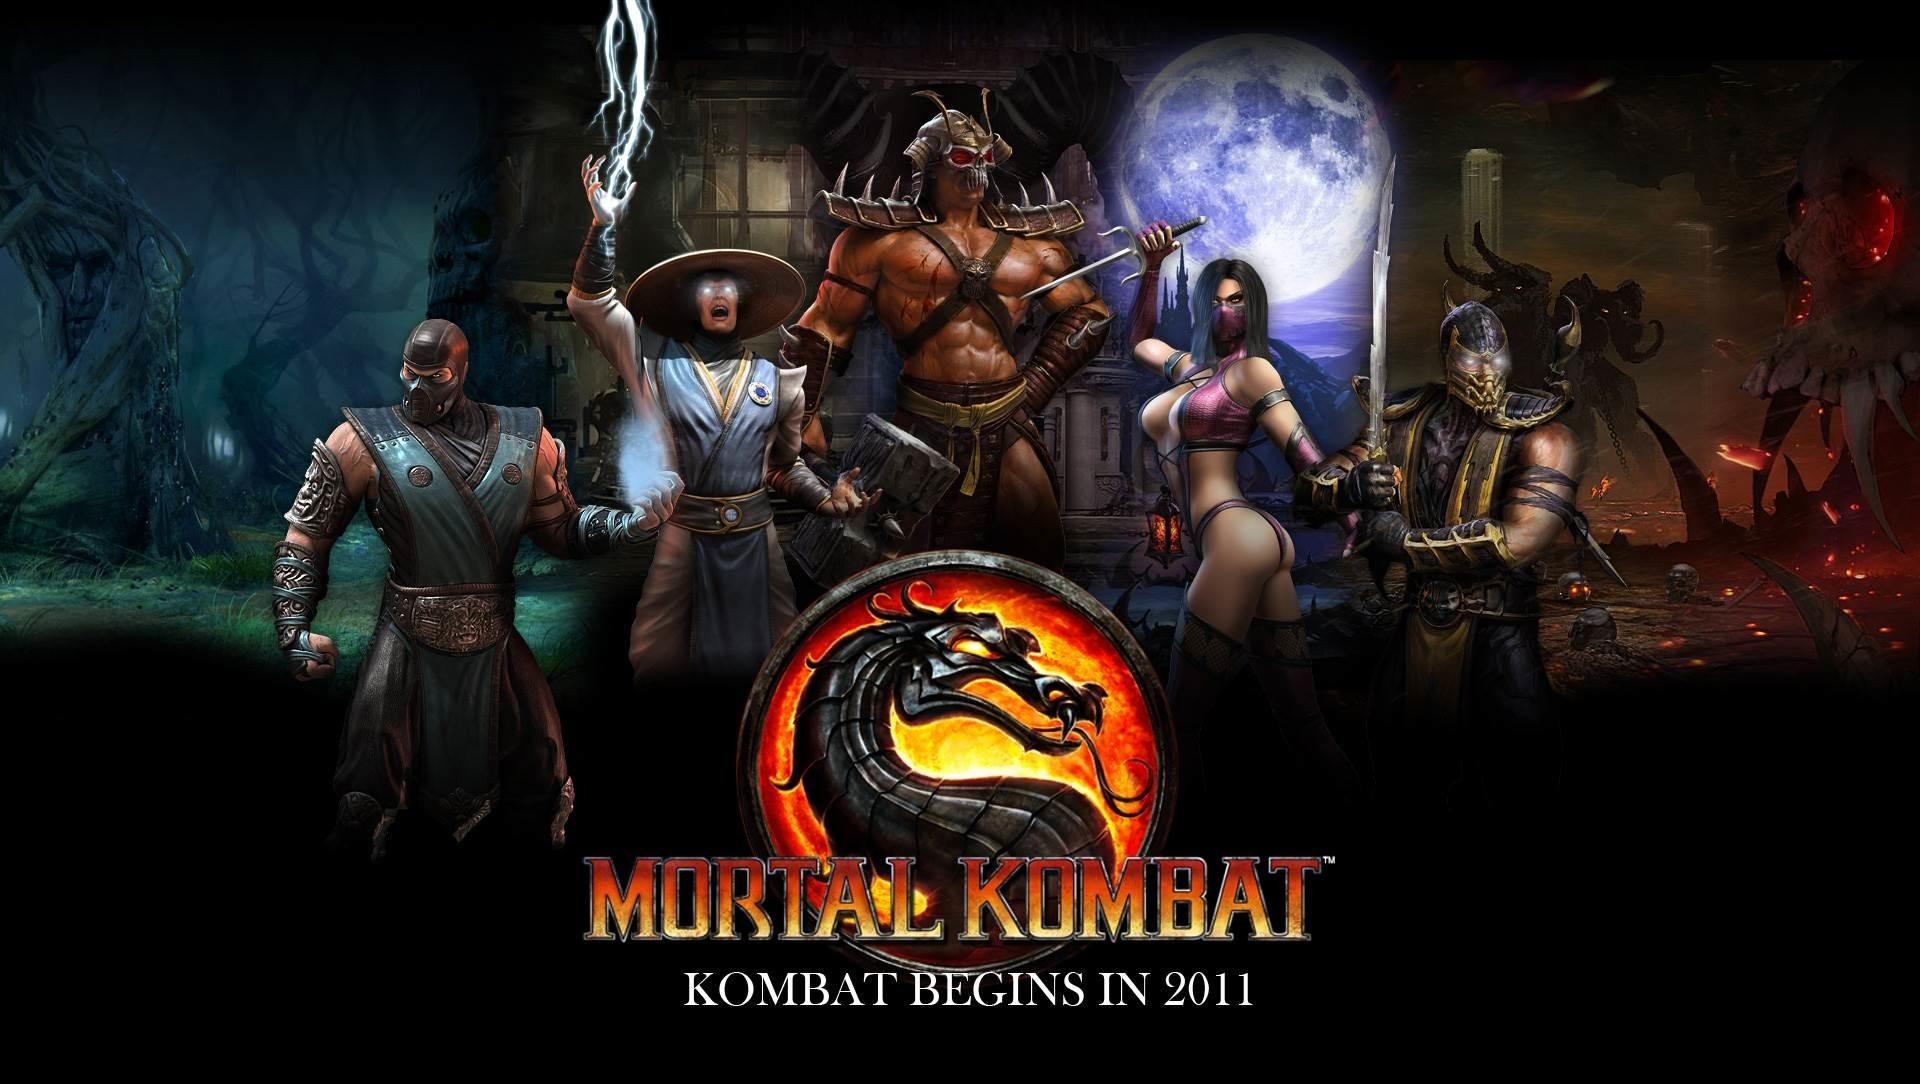 Mortal Kombat Kitana Wallpaper ·① WallpaperTag